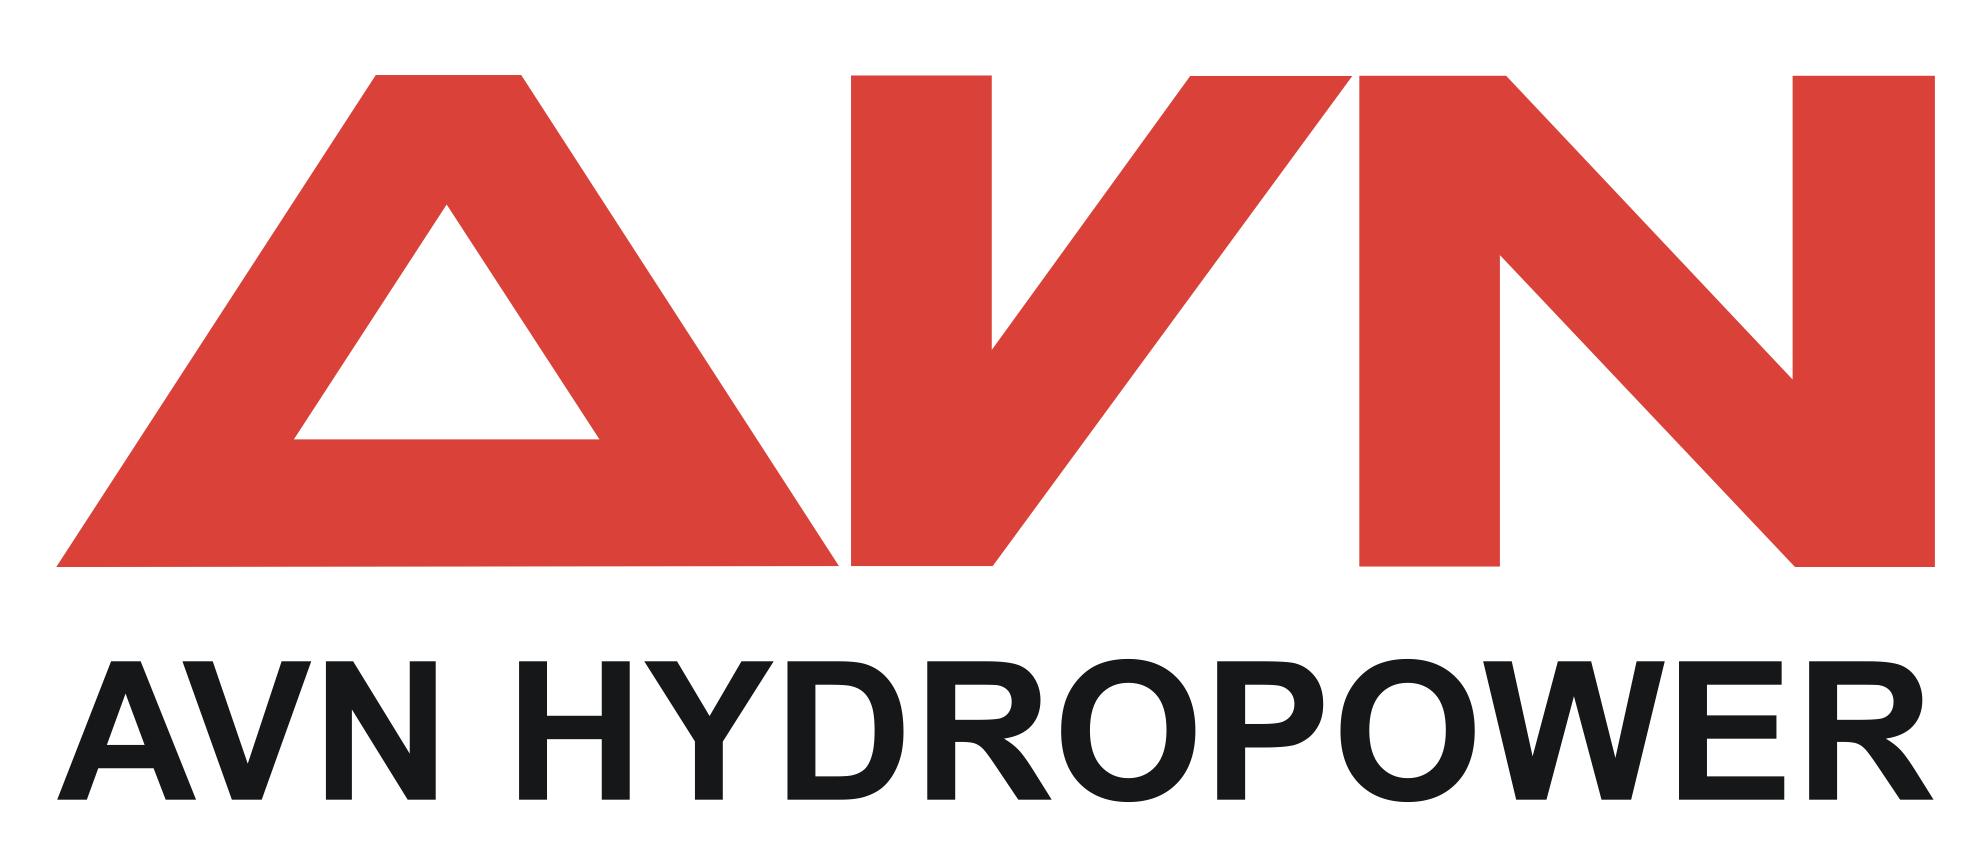 AVN Hydropower.png